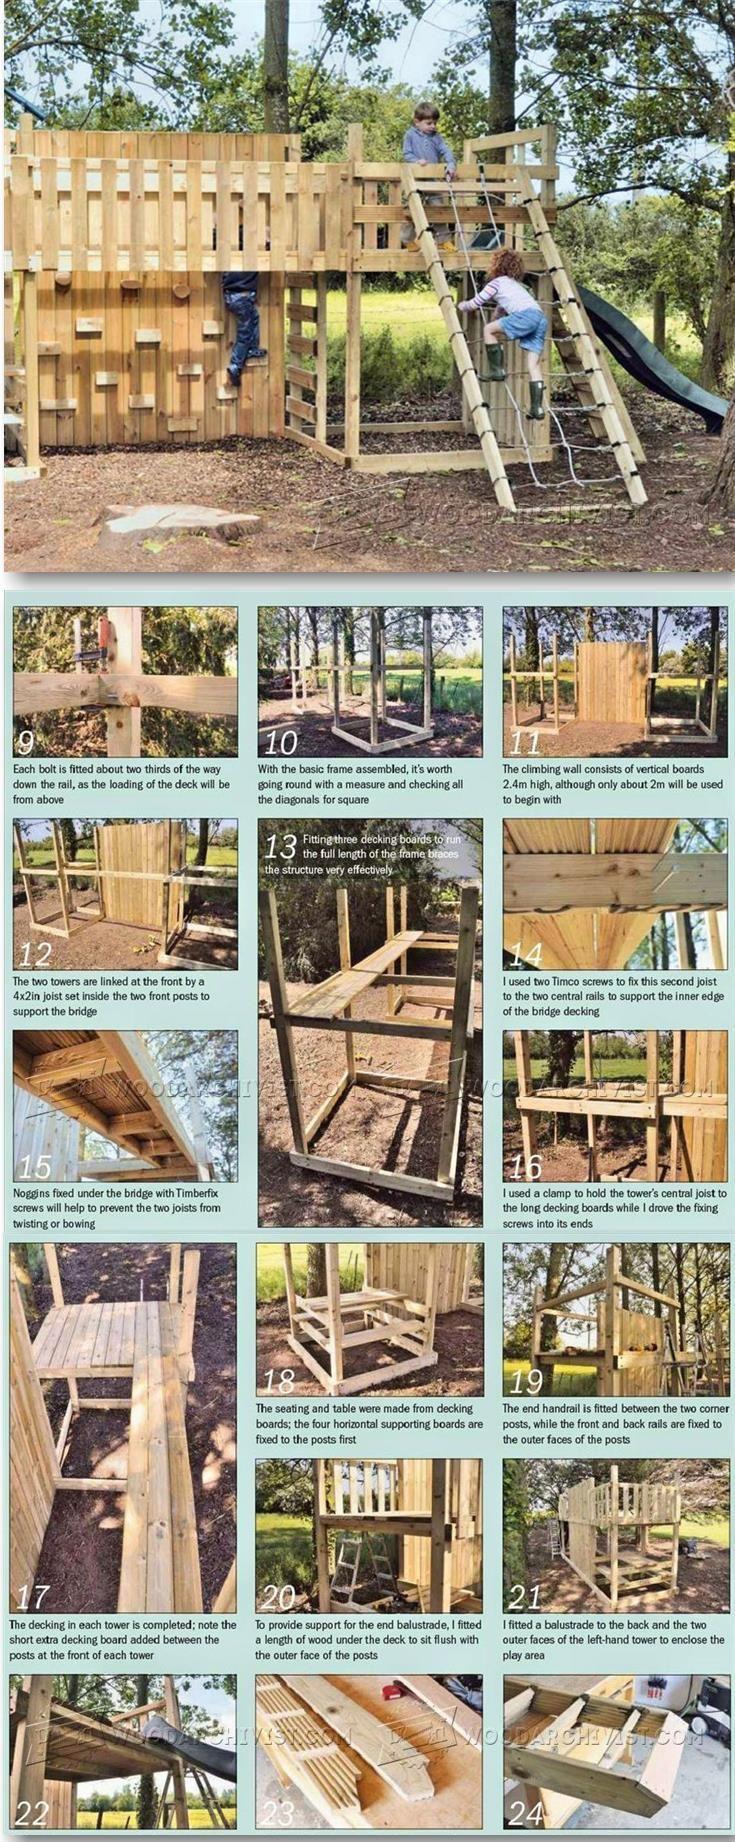 Kids Climbing Frame Plans - Children's Outdoor Plans and Projects   WoodArchivist.com